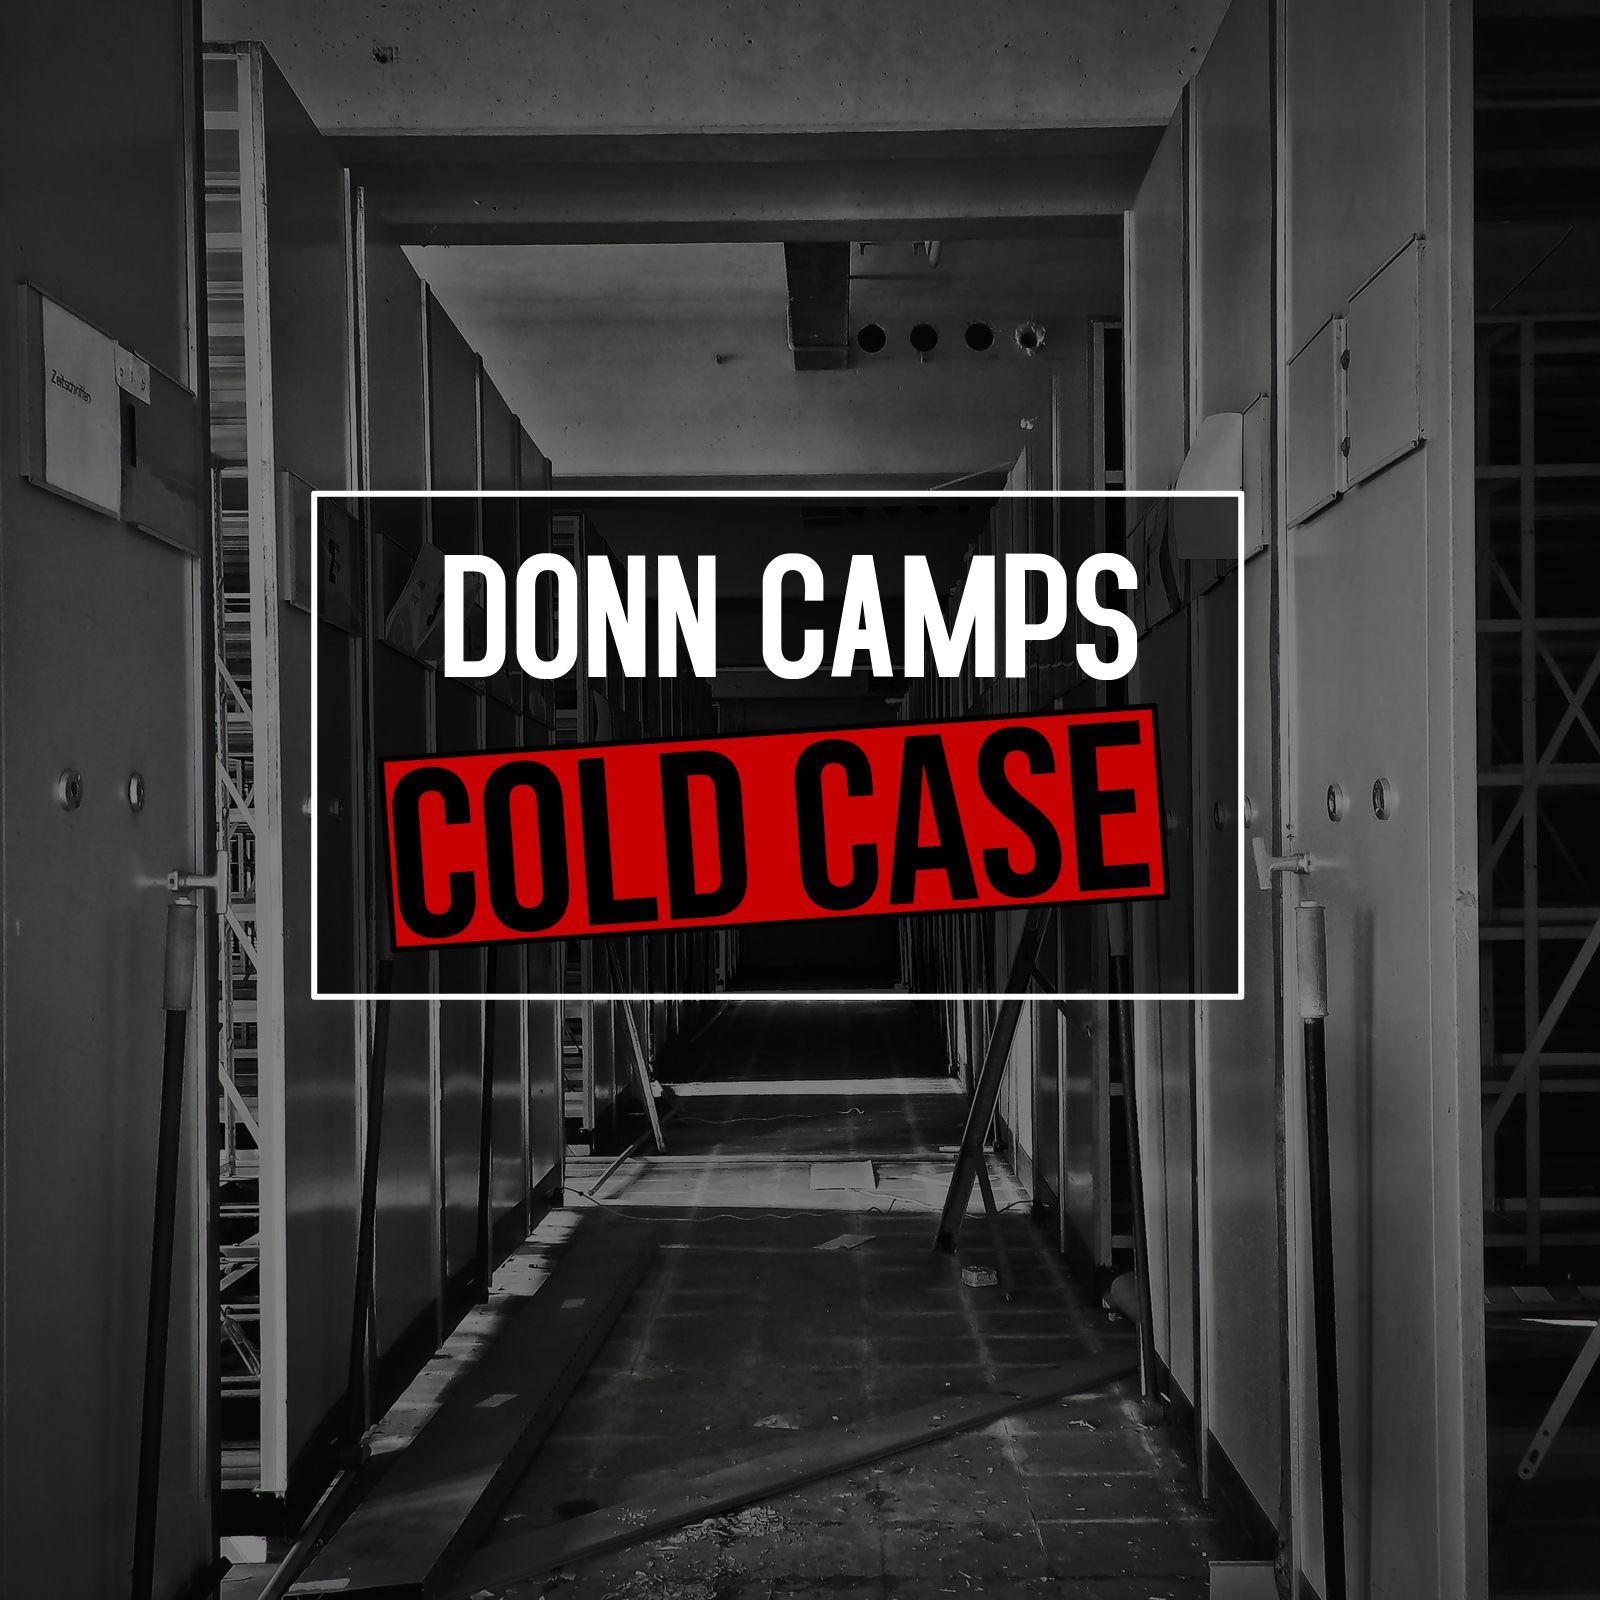 donn_camps_-_cold_case_dhamma_chanda_music.jpg